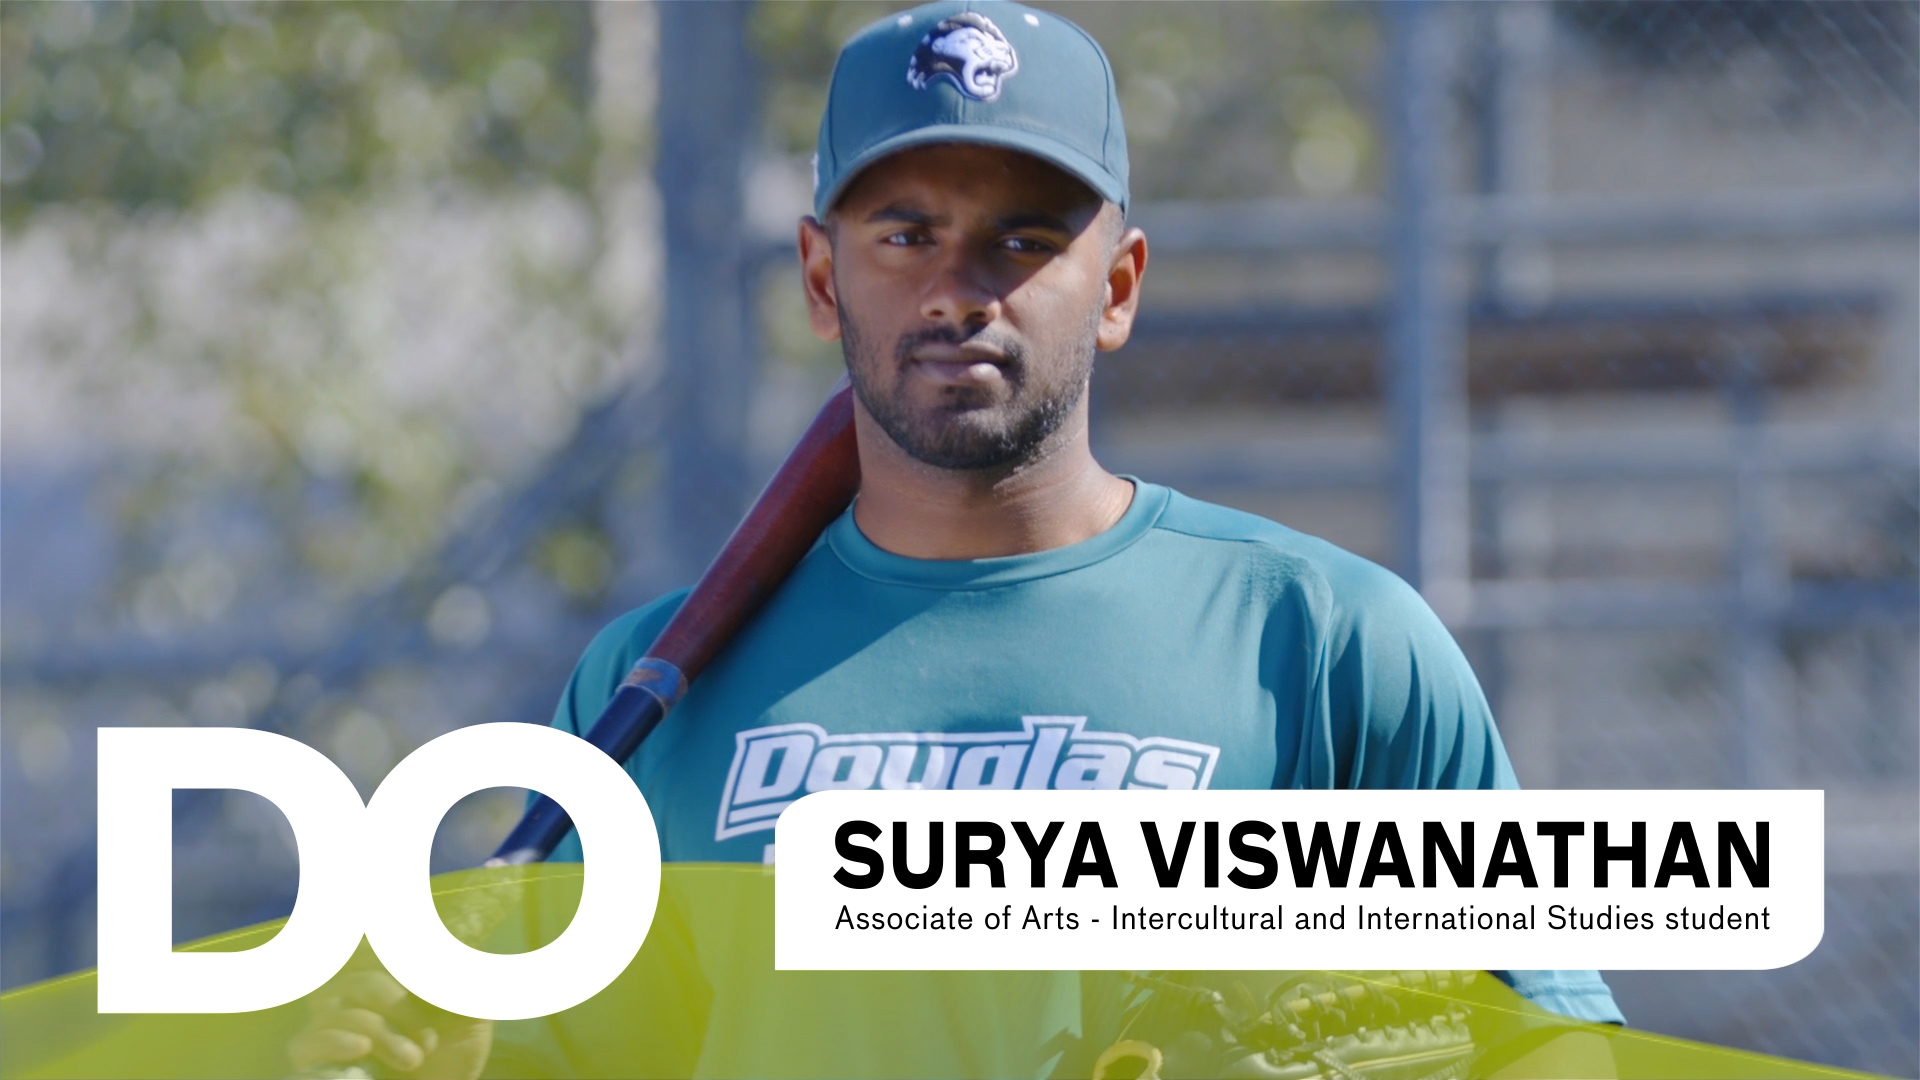 Douglas College Student Showcase – Surya Viswanathan